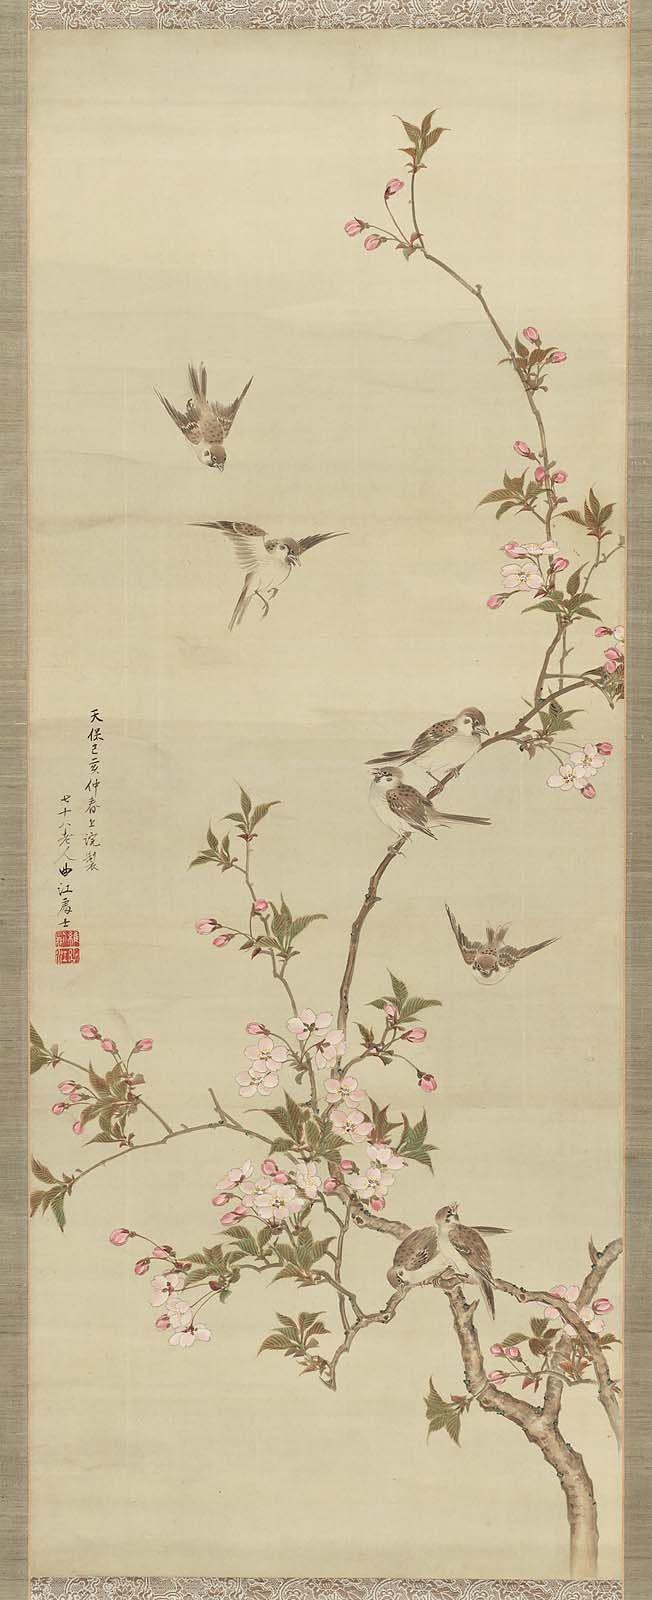 sparrows and cherry 1839 (tenpô 10) koike kyokukô, japanese, dates